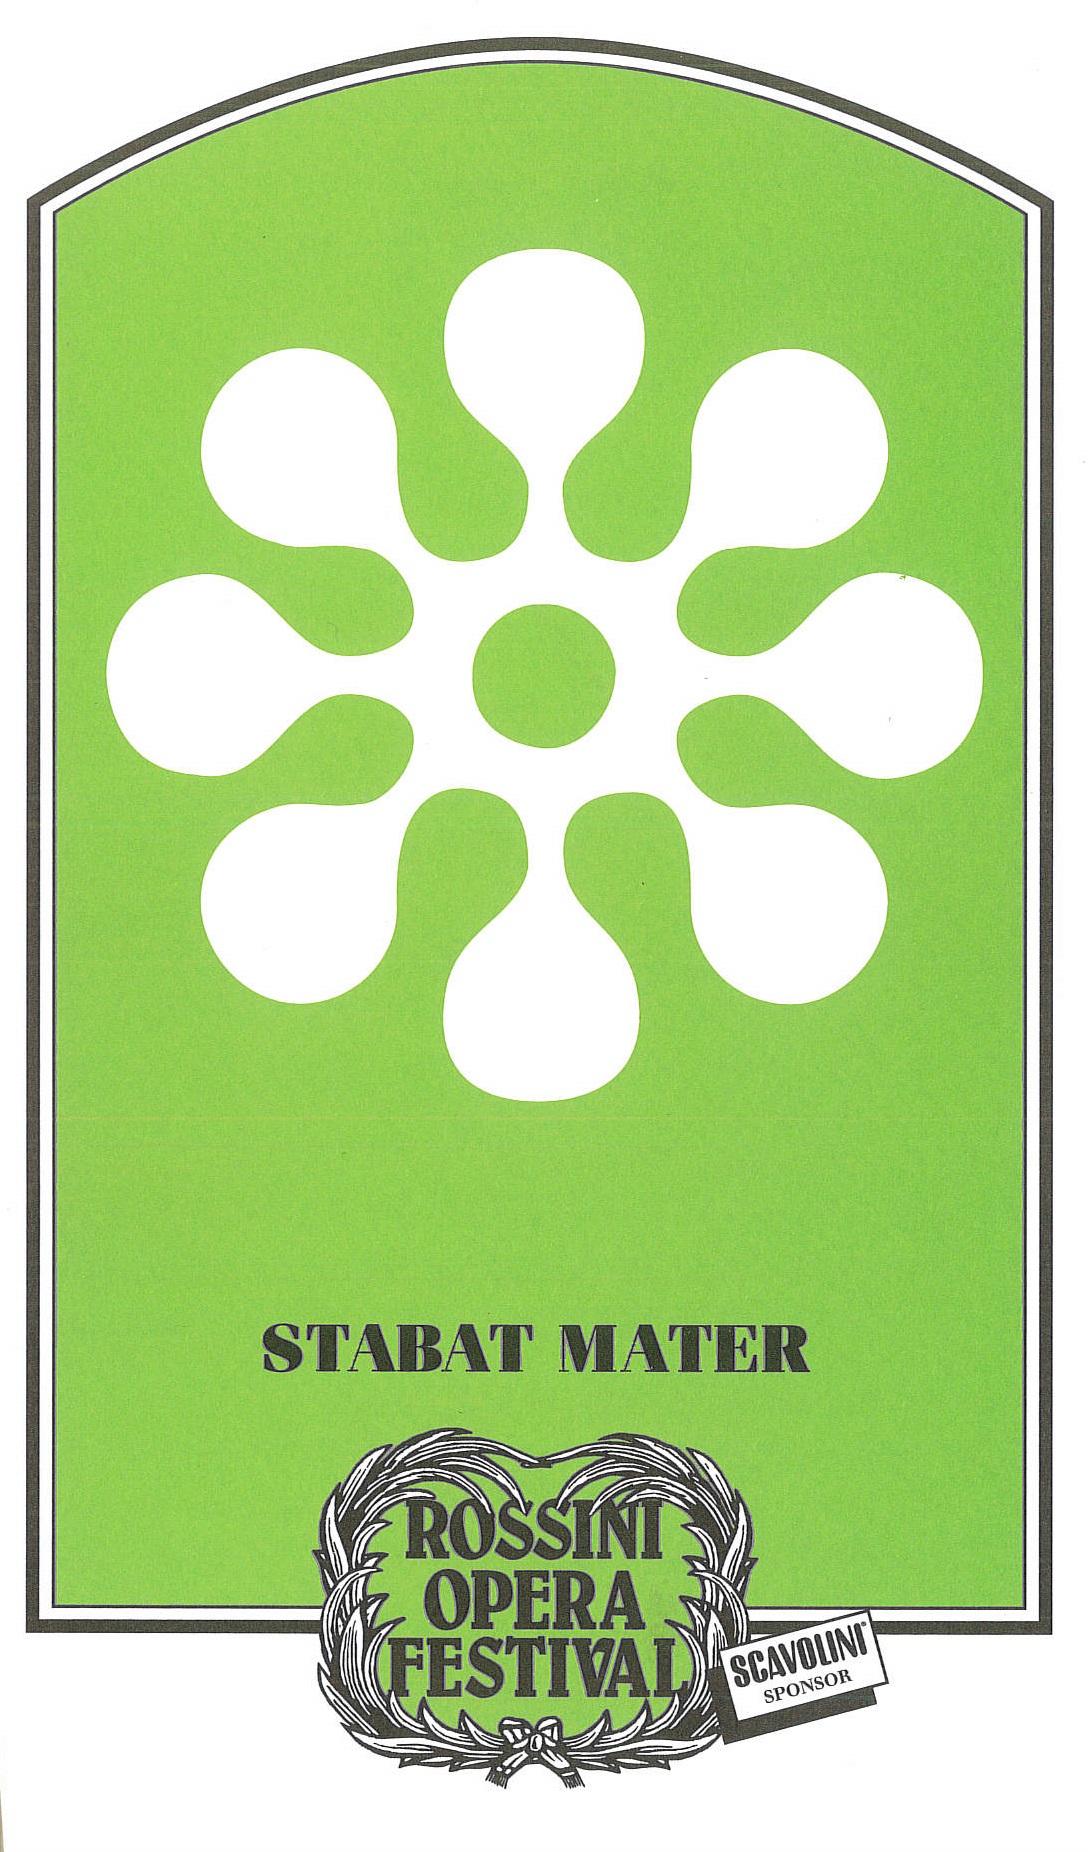 Stabat Mater 2001